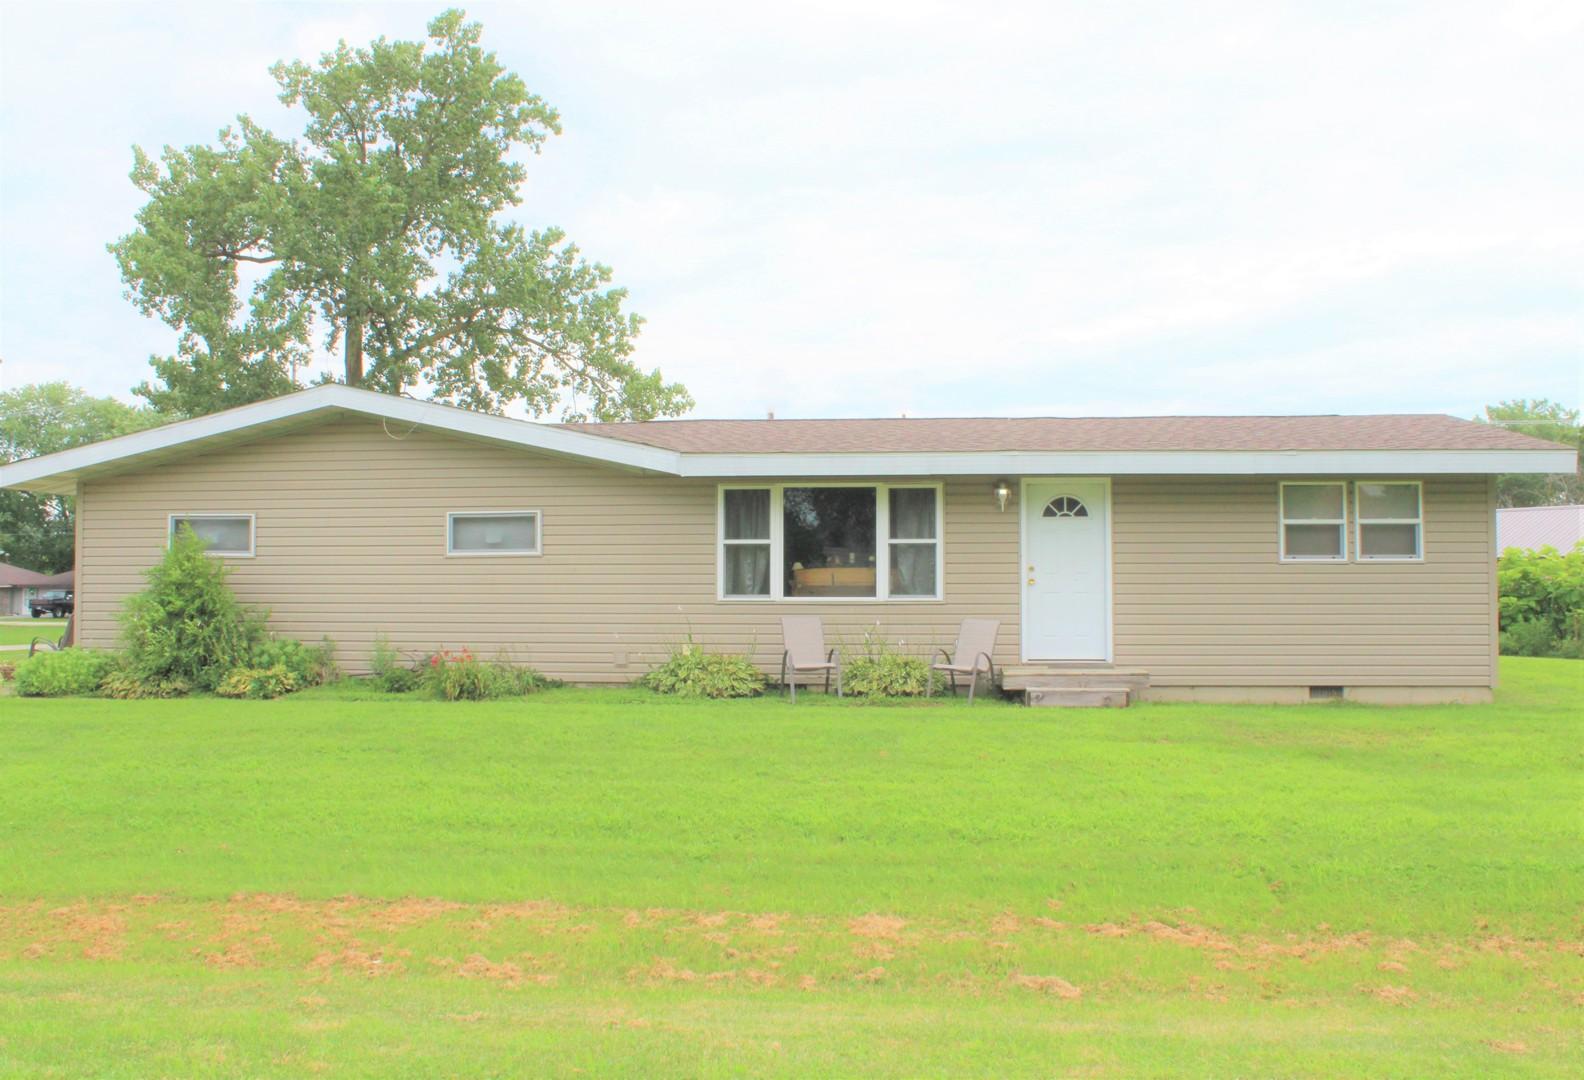 643-645 East 1st, Coal City, Illinois, 60416